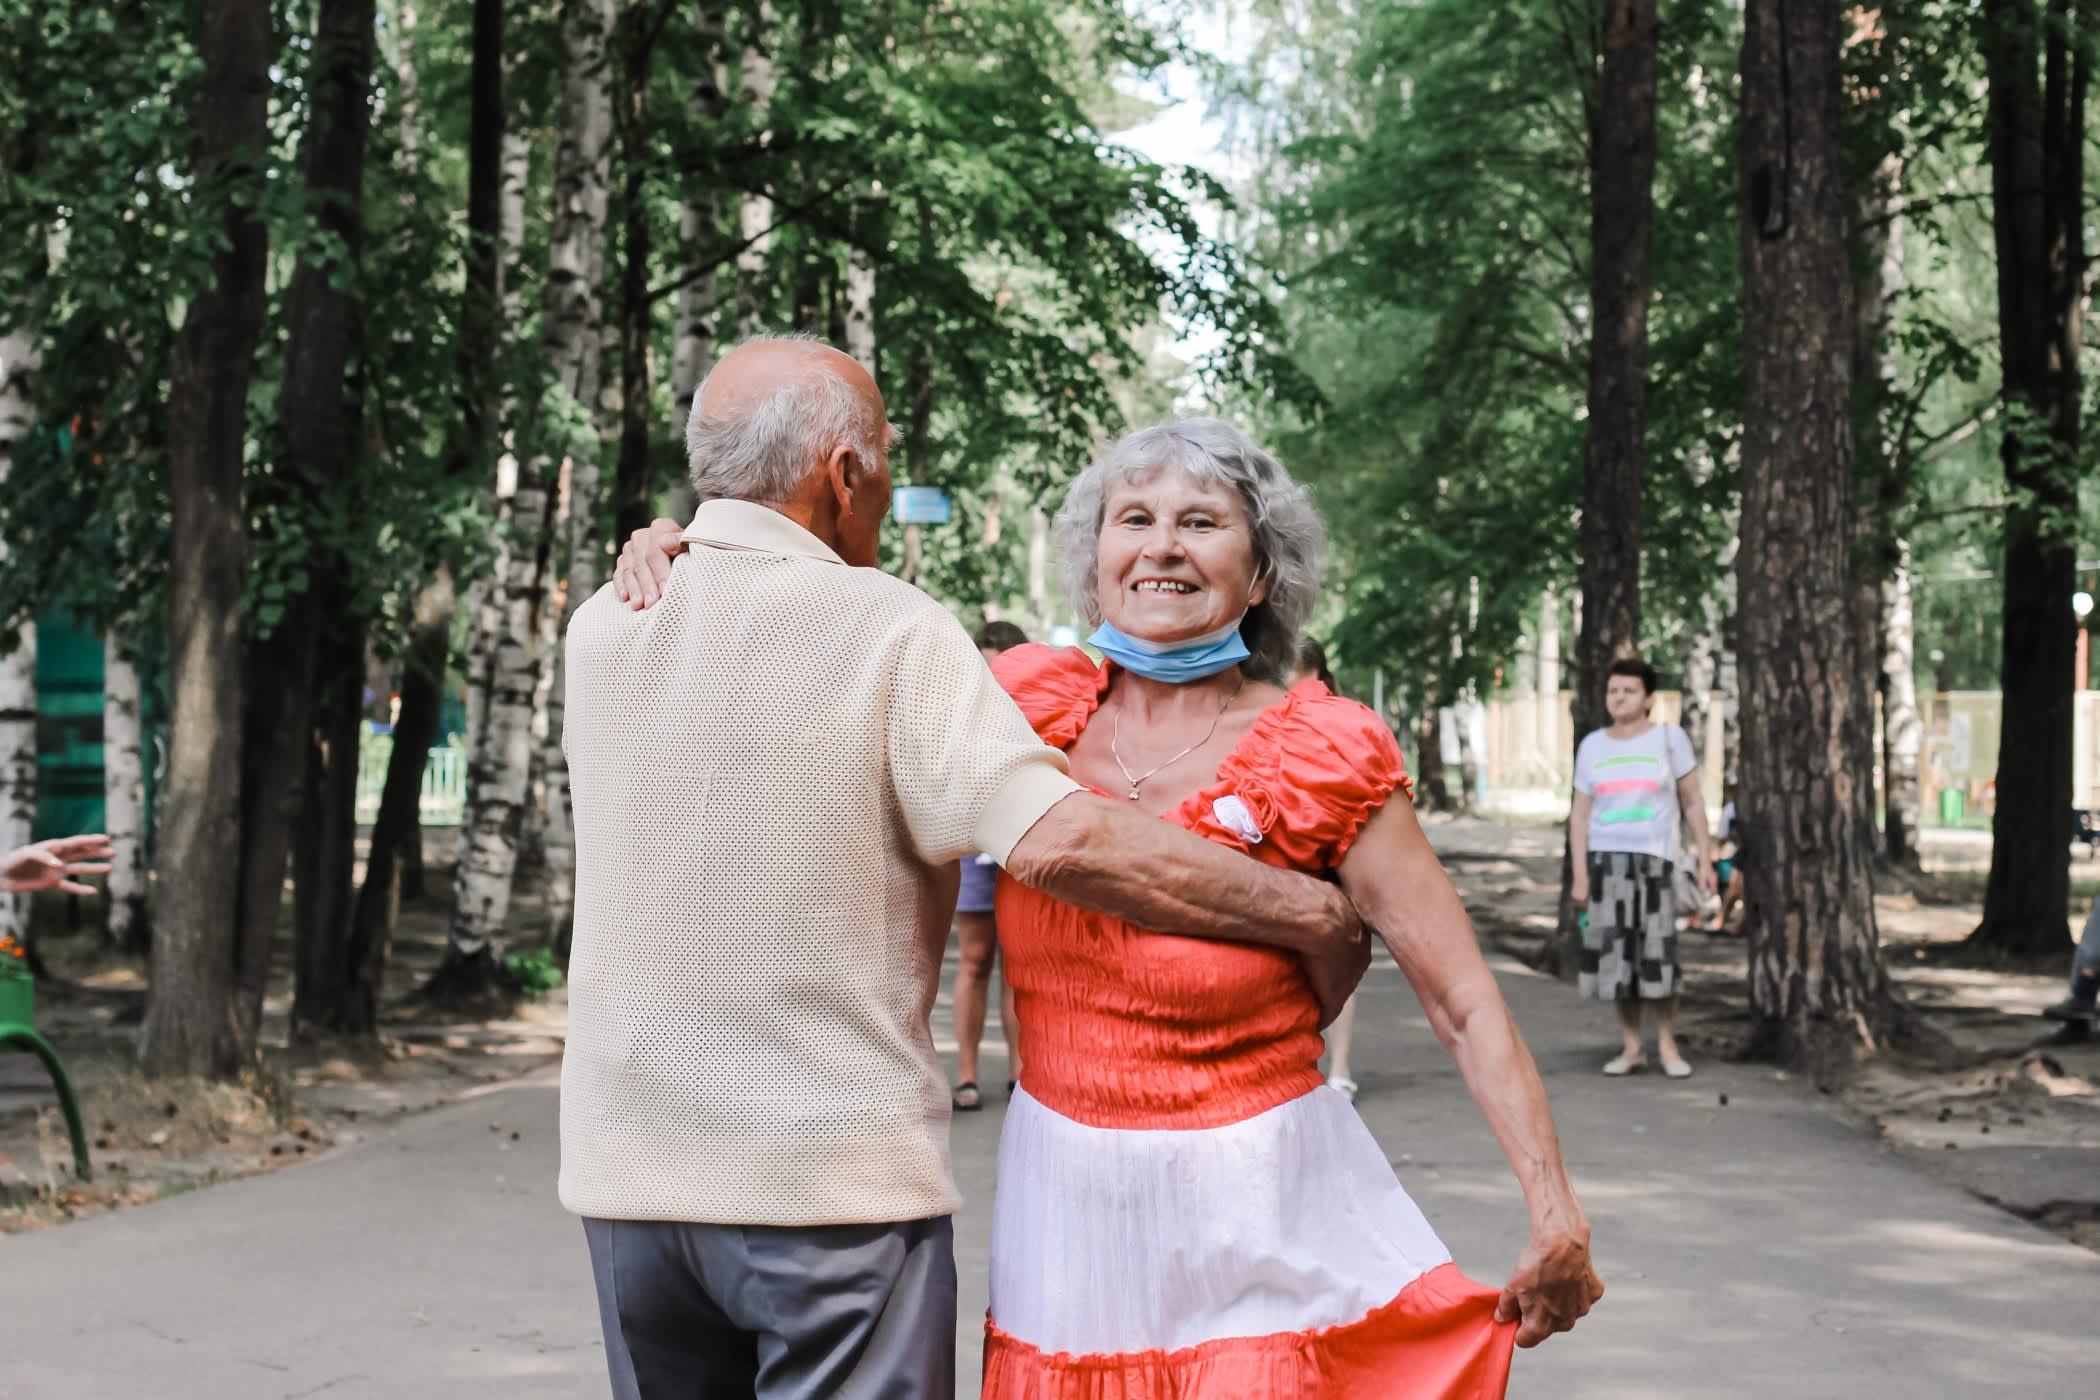 106906190-1625240816505-central-park-active-seniors-young-at-heart-outdoor-activity-summer-holidays-street-dancing_t20_PJvGZr.jpg?v=1625240856